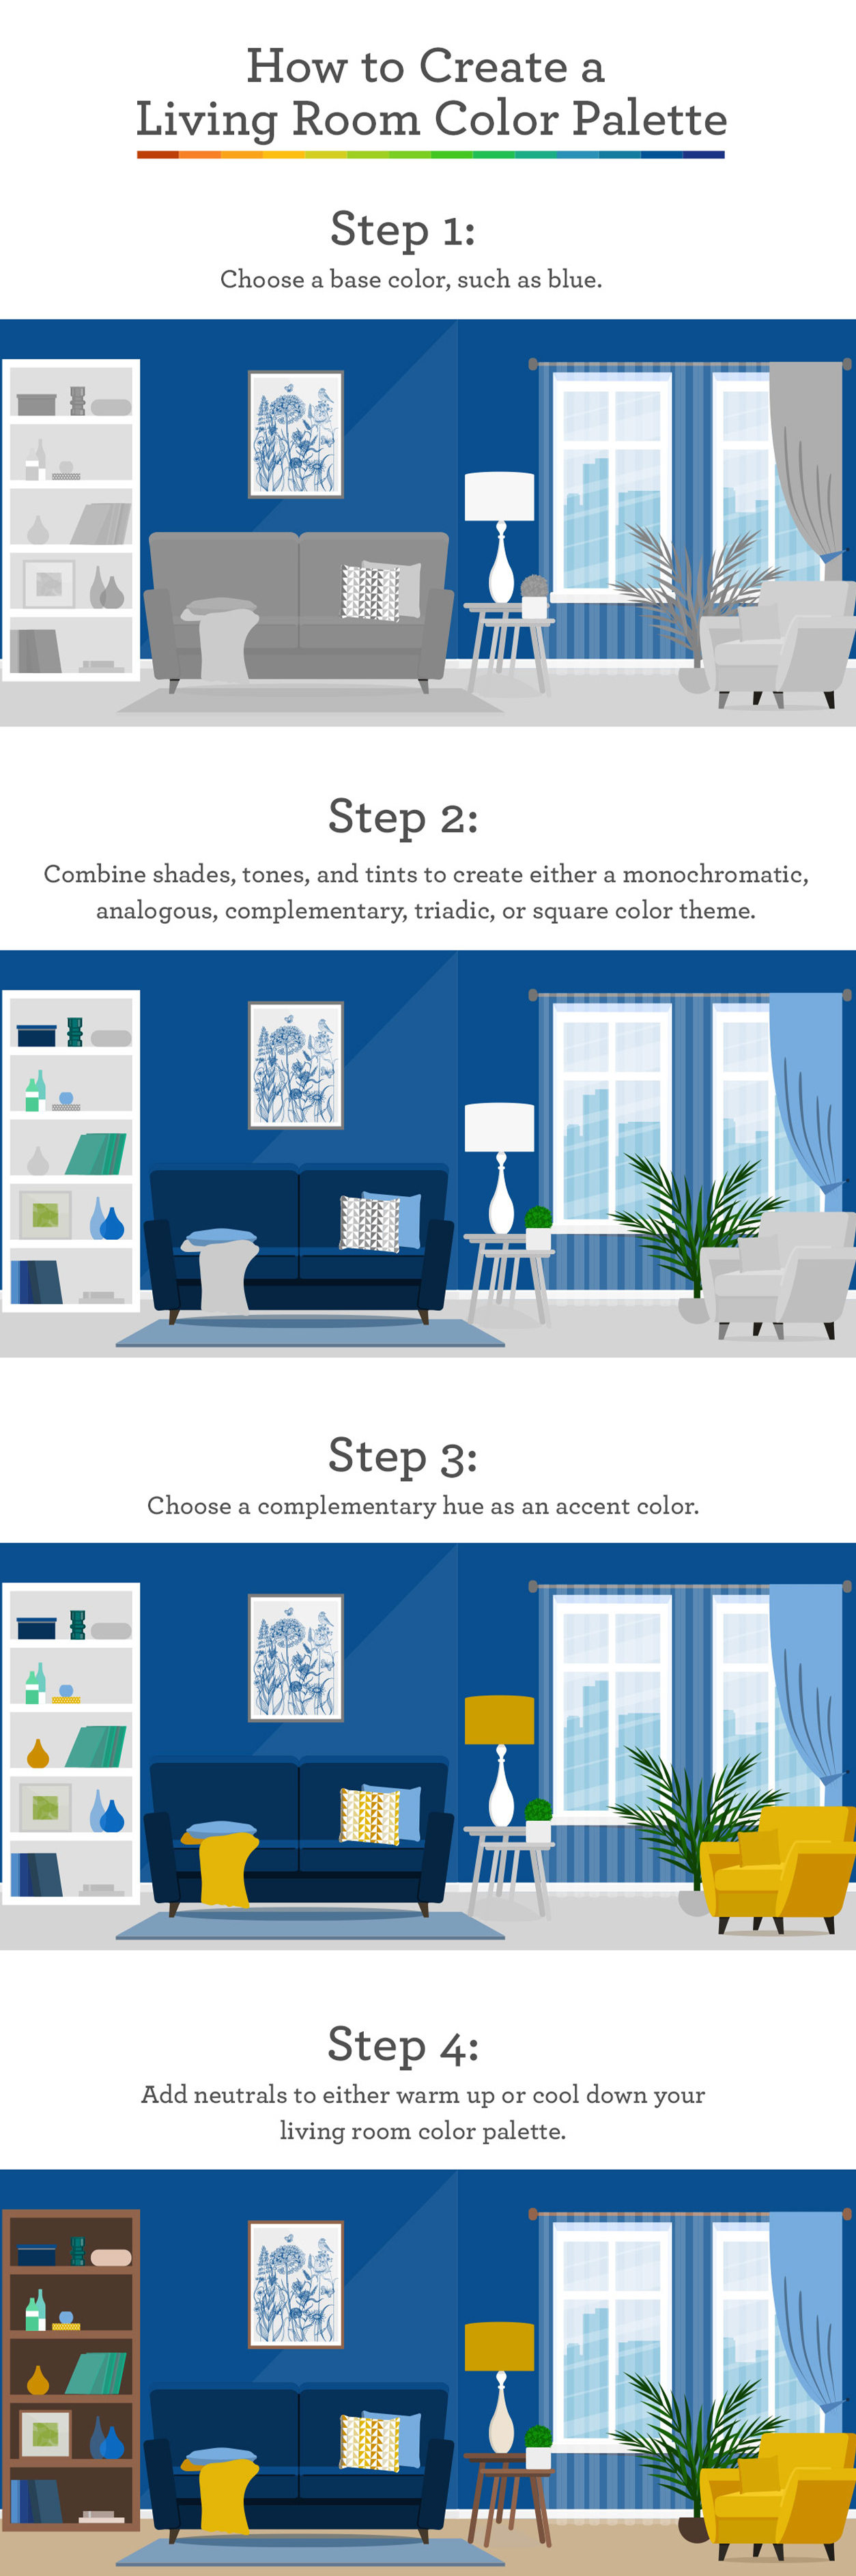 Interior design basics of color palette